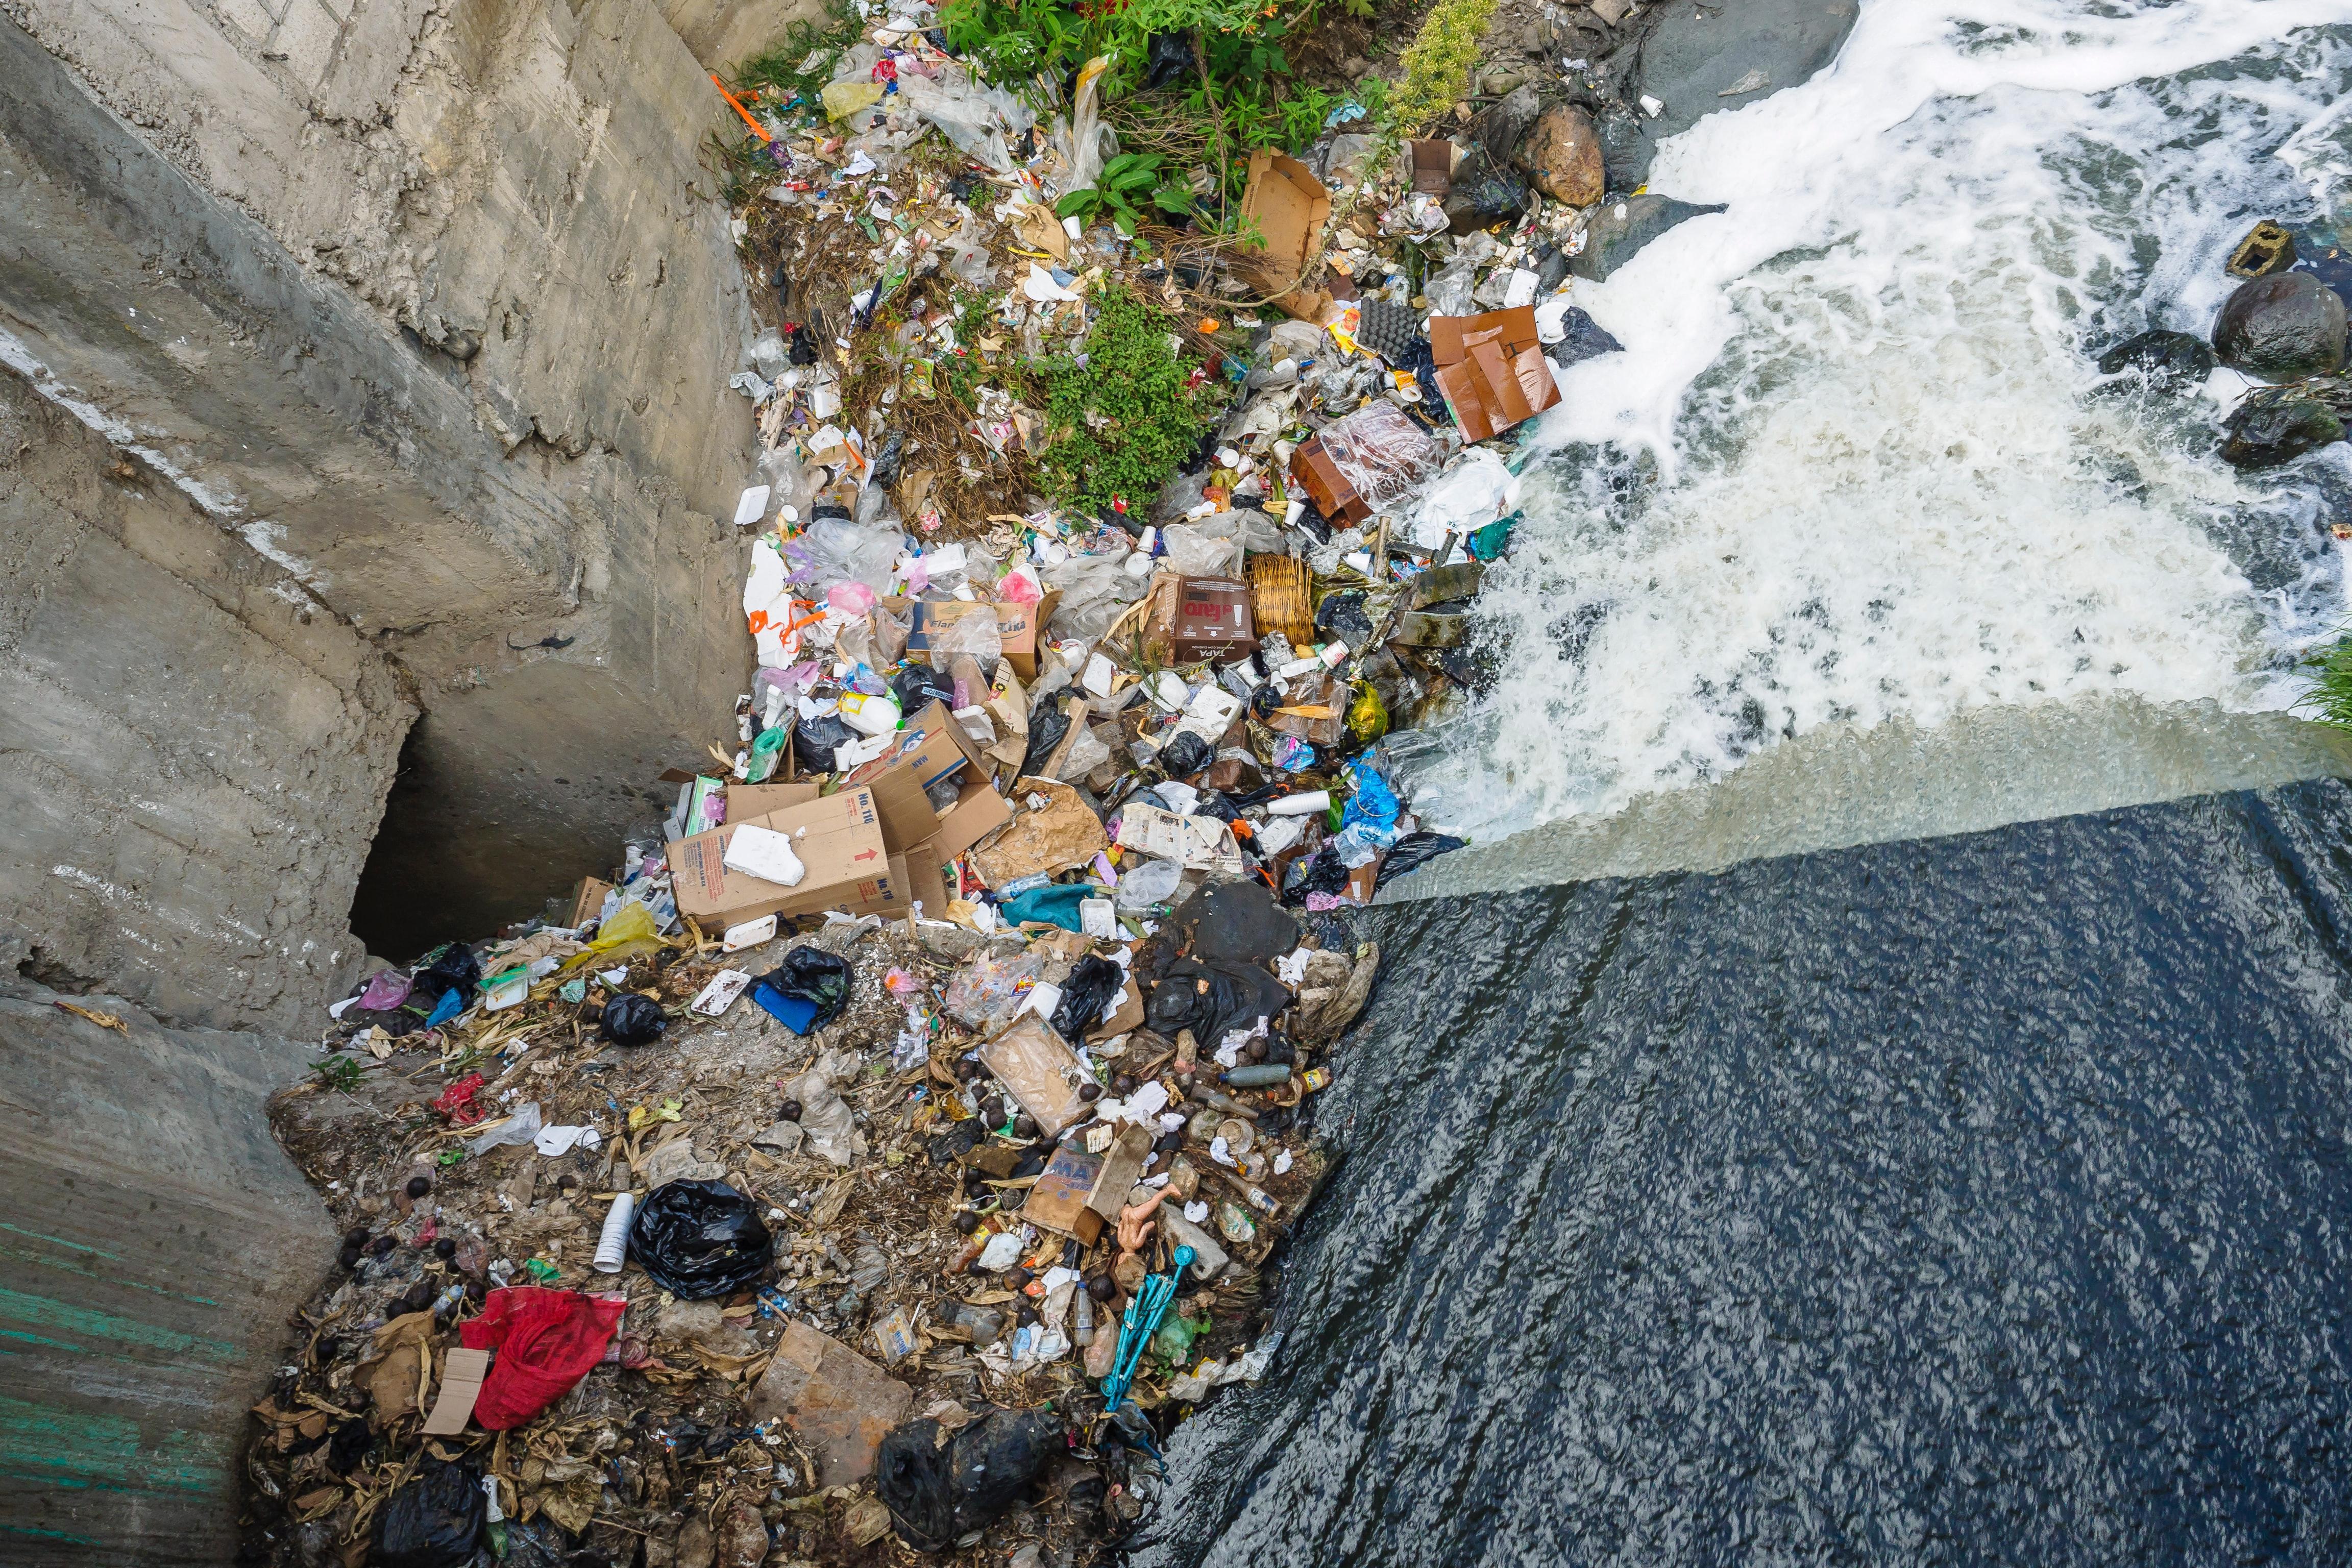 product returns leave a negative environmental footprint